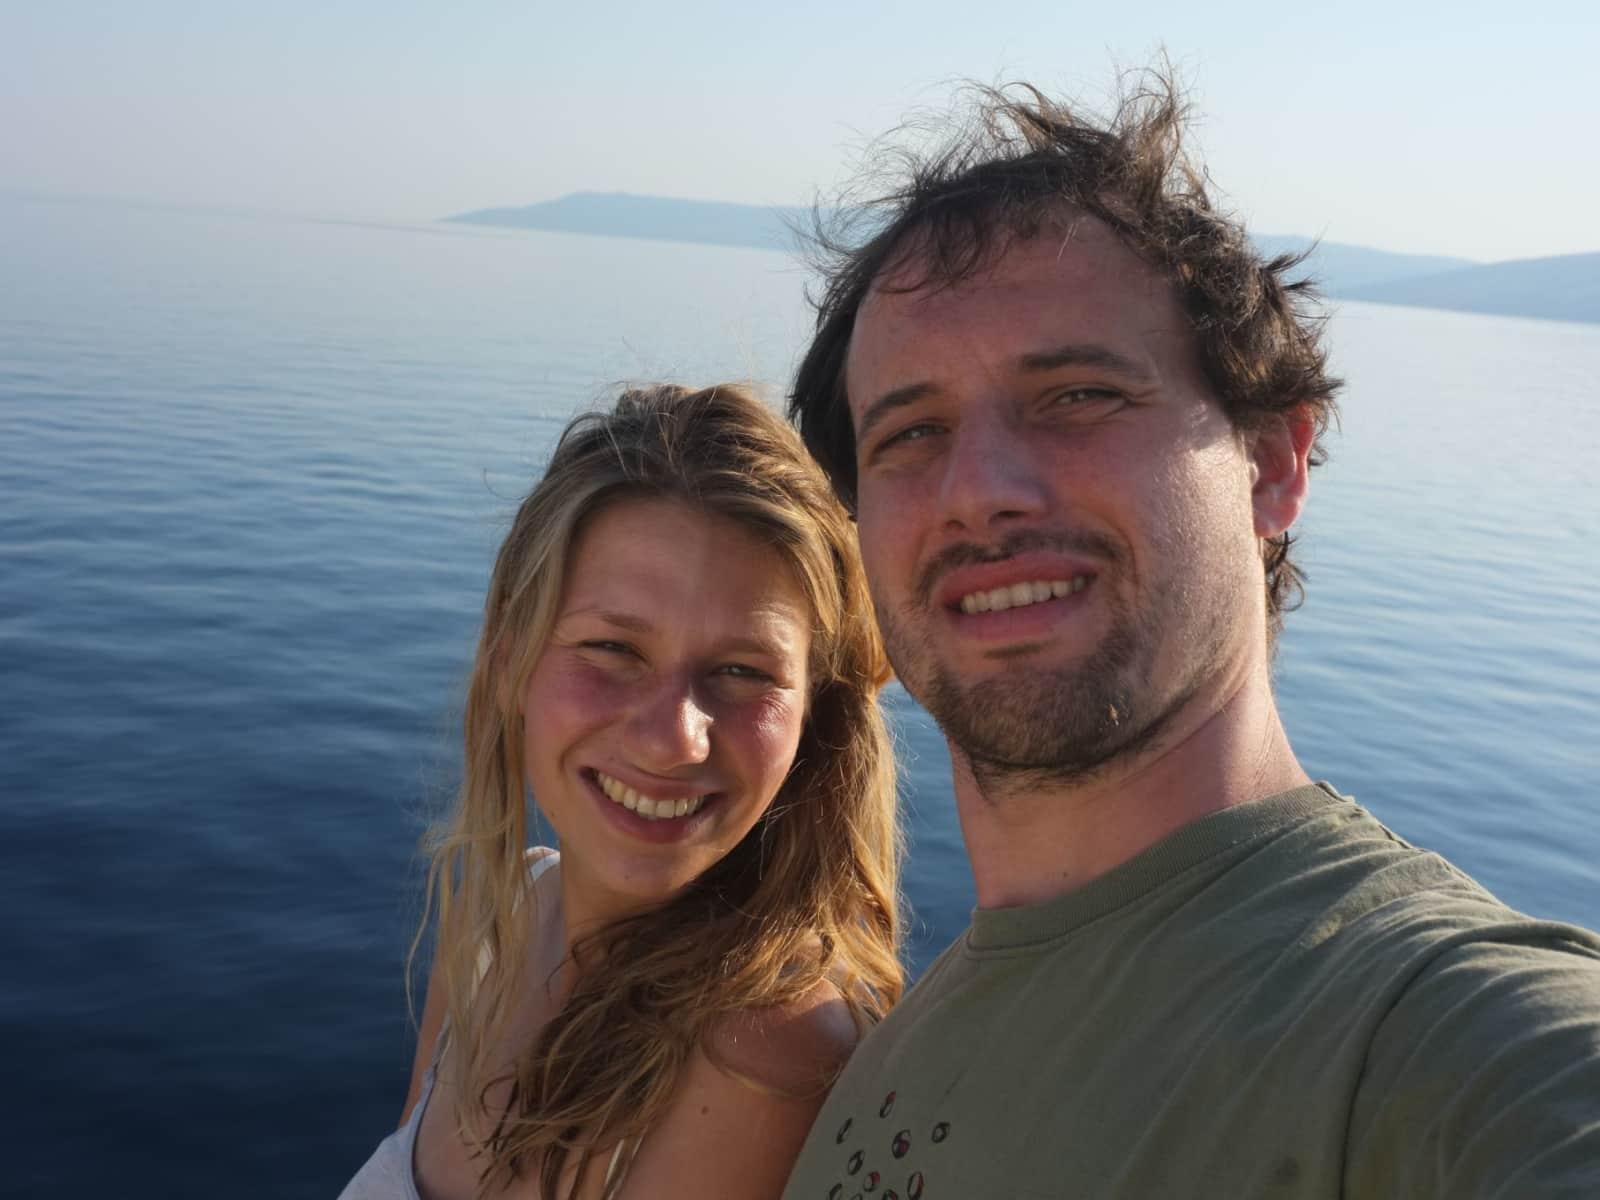 Kristina & Felix from Berlin, Germany